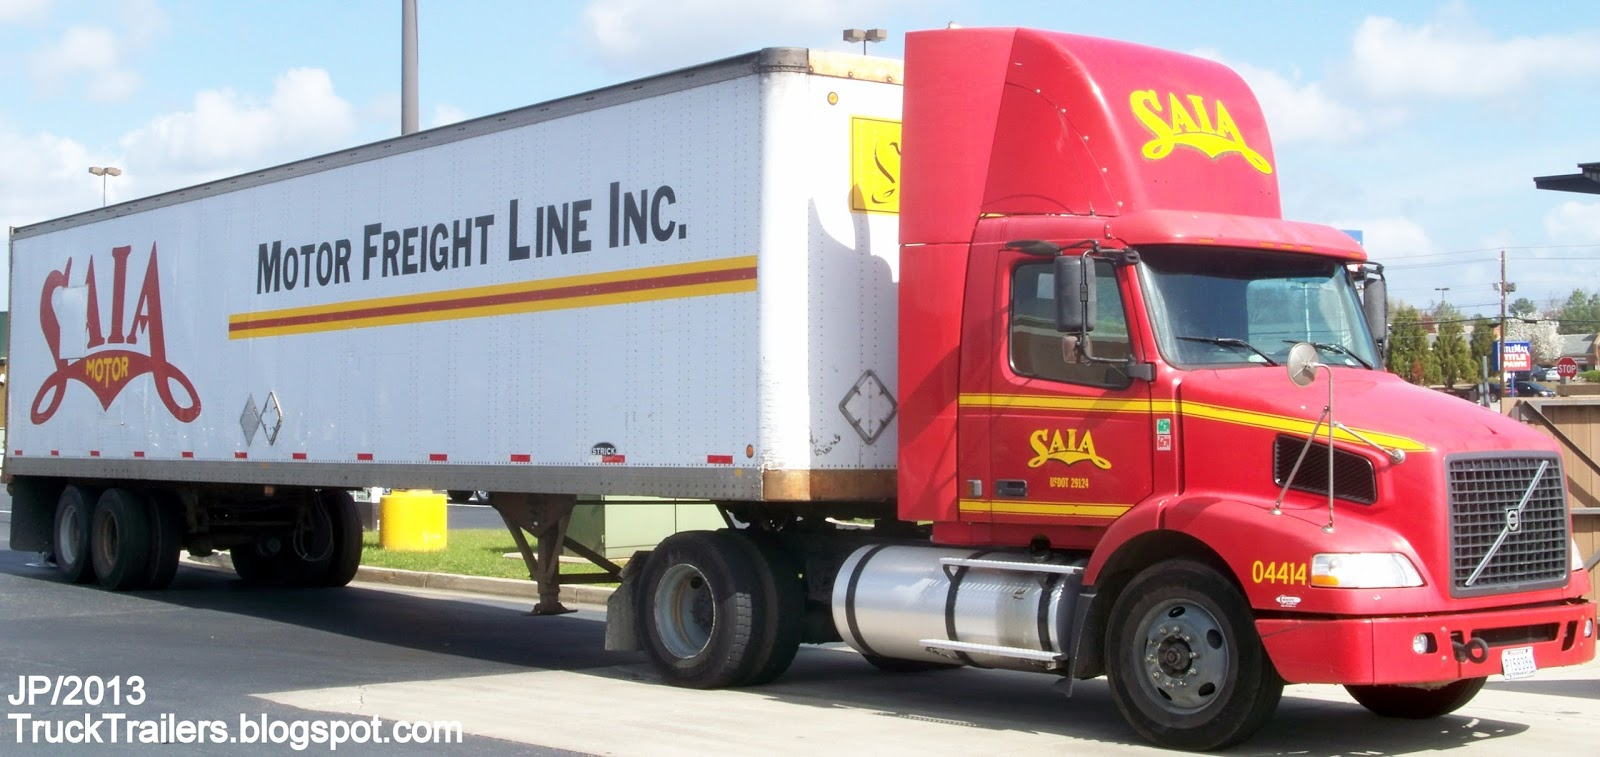 SAIA Motor Freight Line Inc. Johns Creek Georgia, Volvo Day Cab Truck, Strick Dry Van Trailer I-75 GA. SAIA LTL Trucking Company